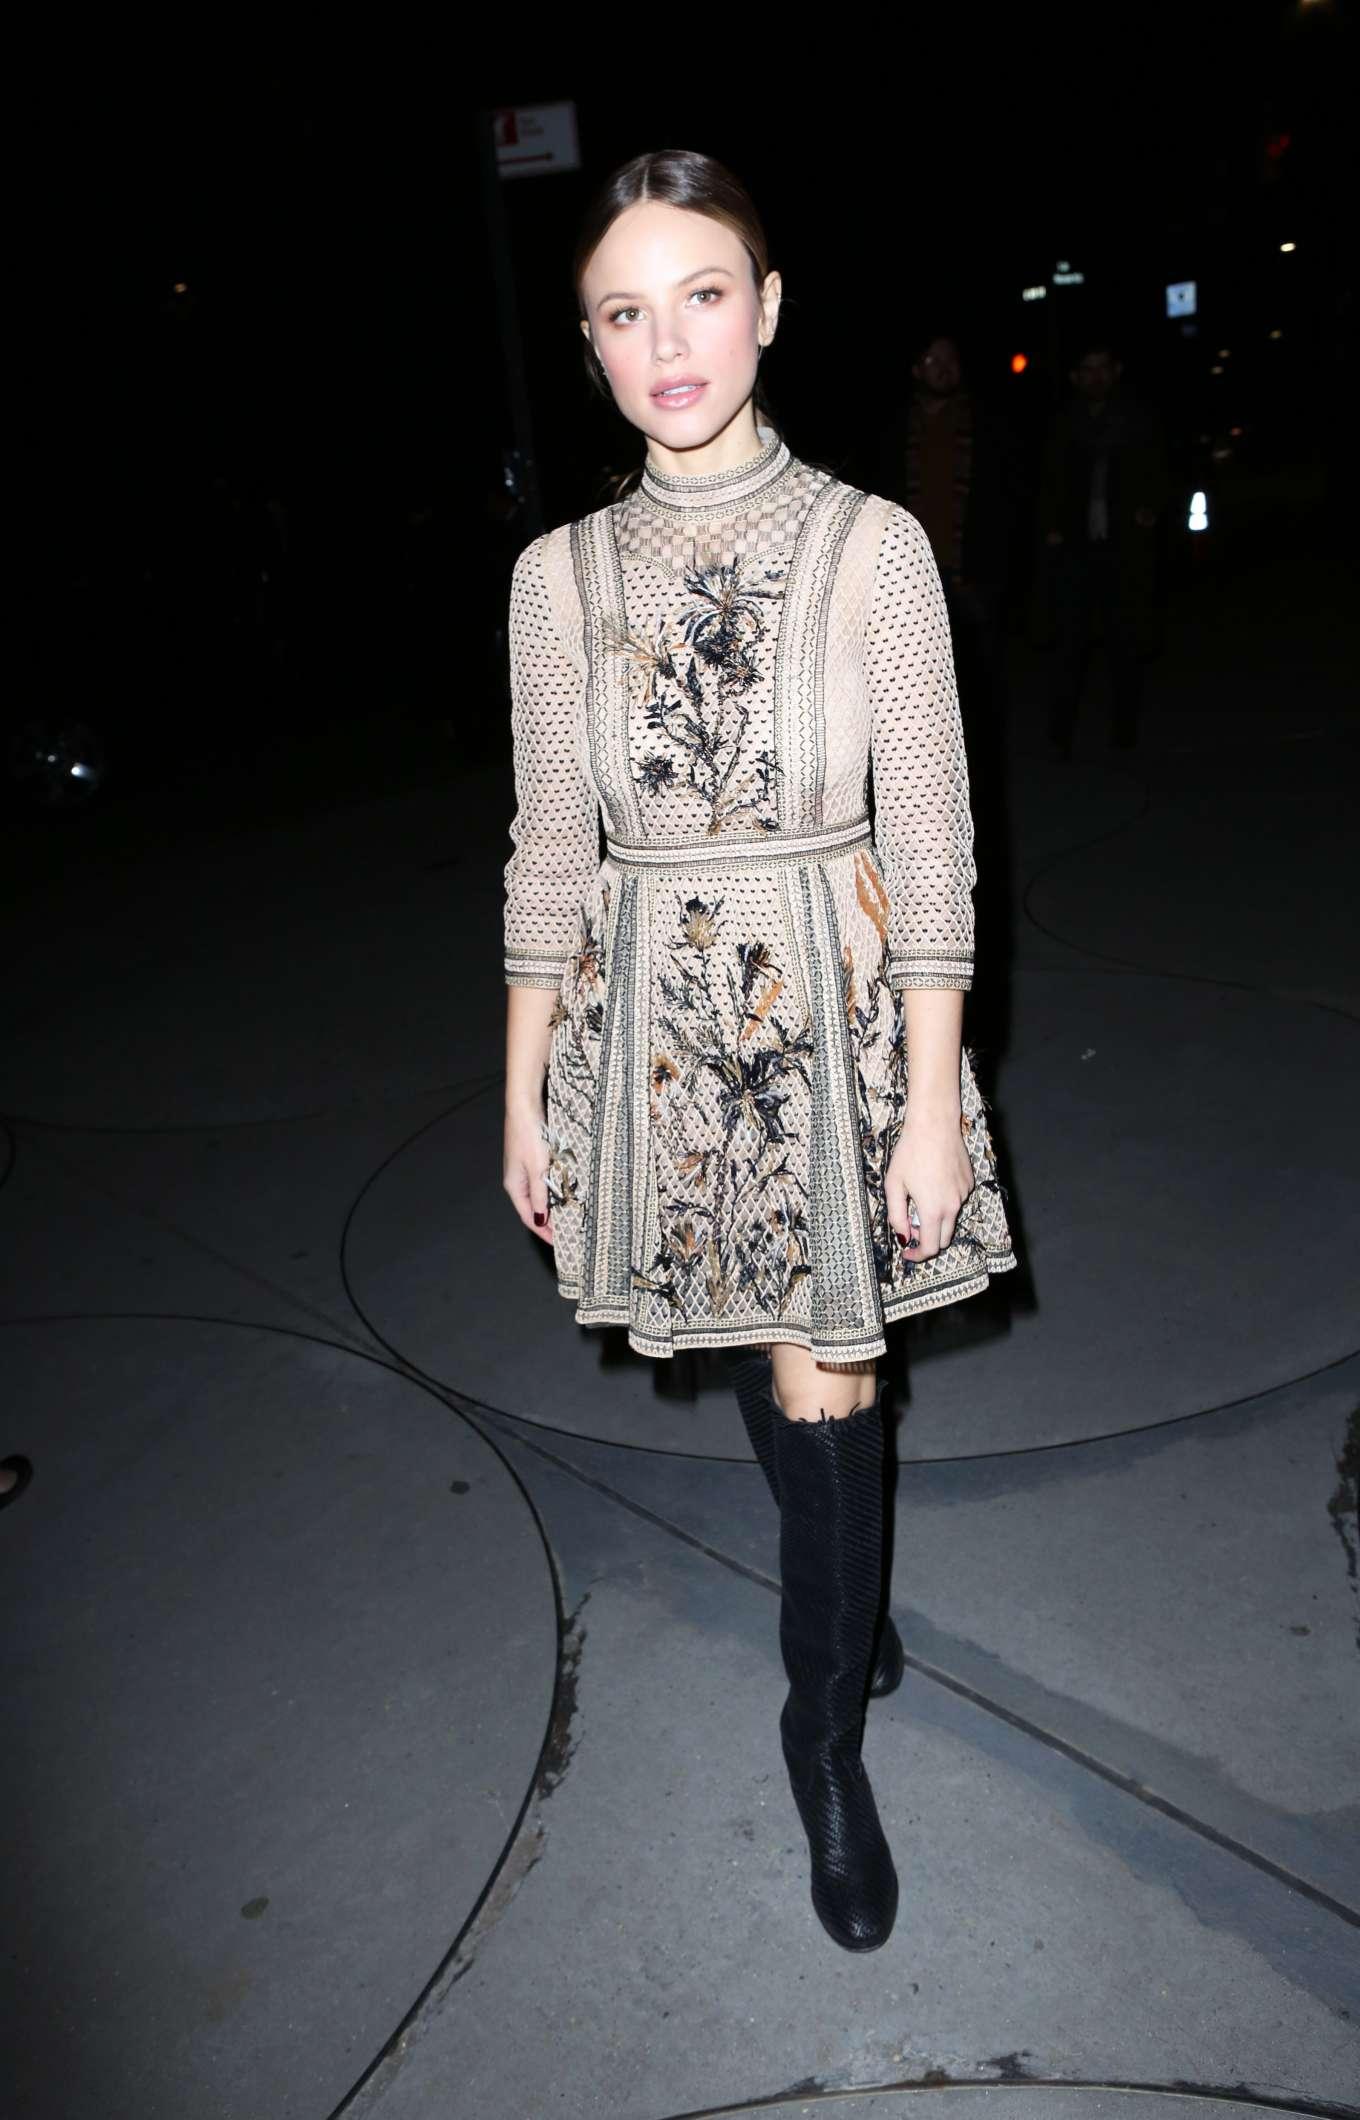 Halston Sage - Arrives at Guggenheim International Gala in New York